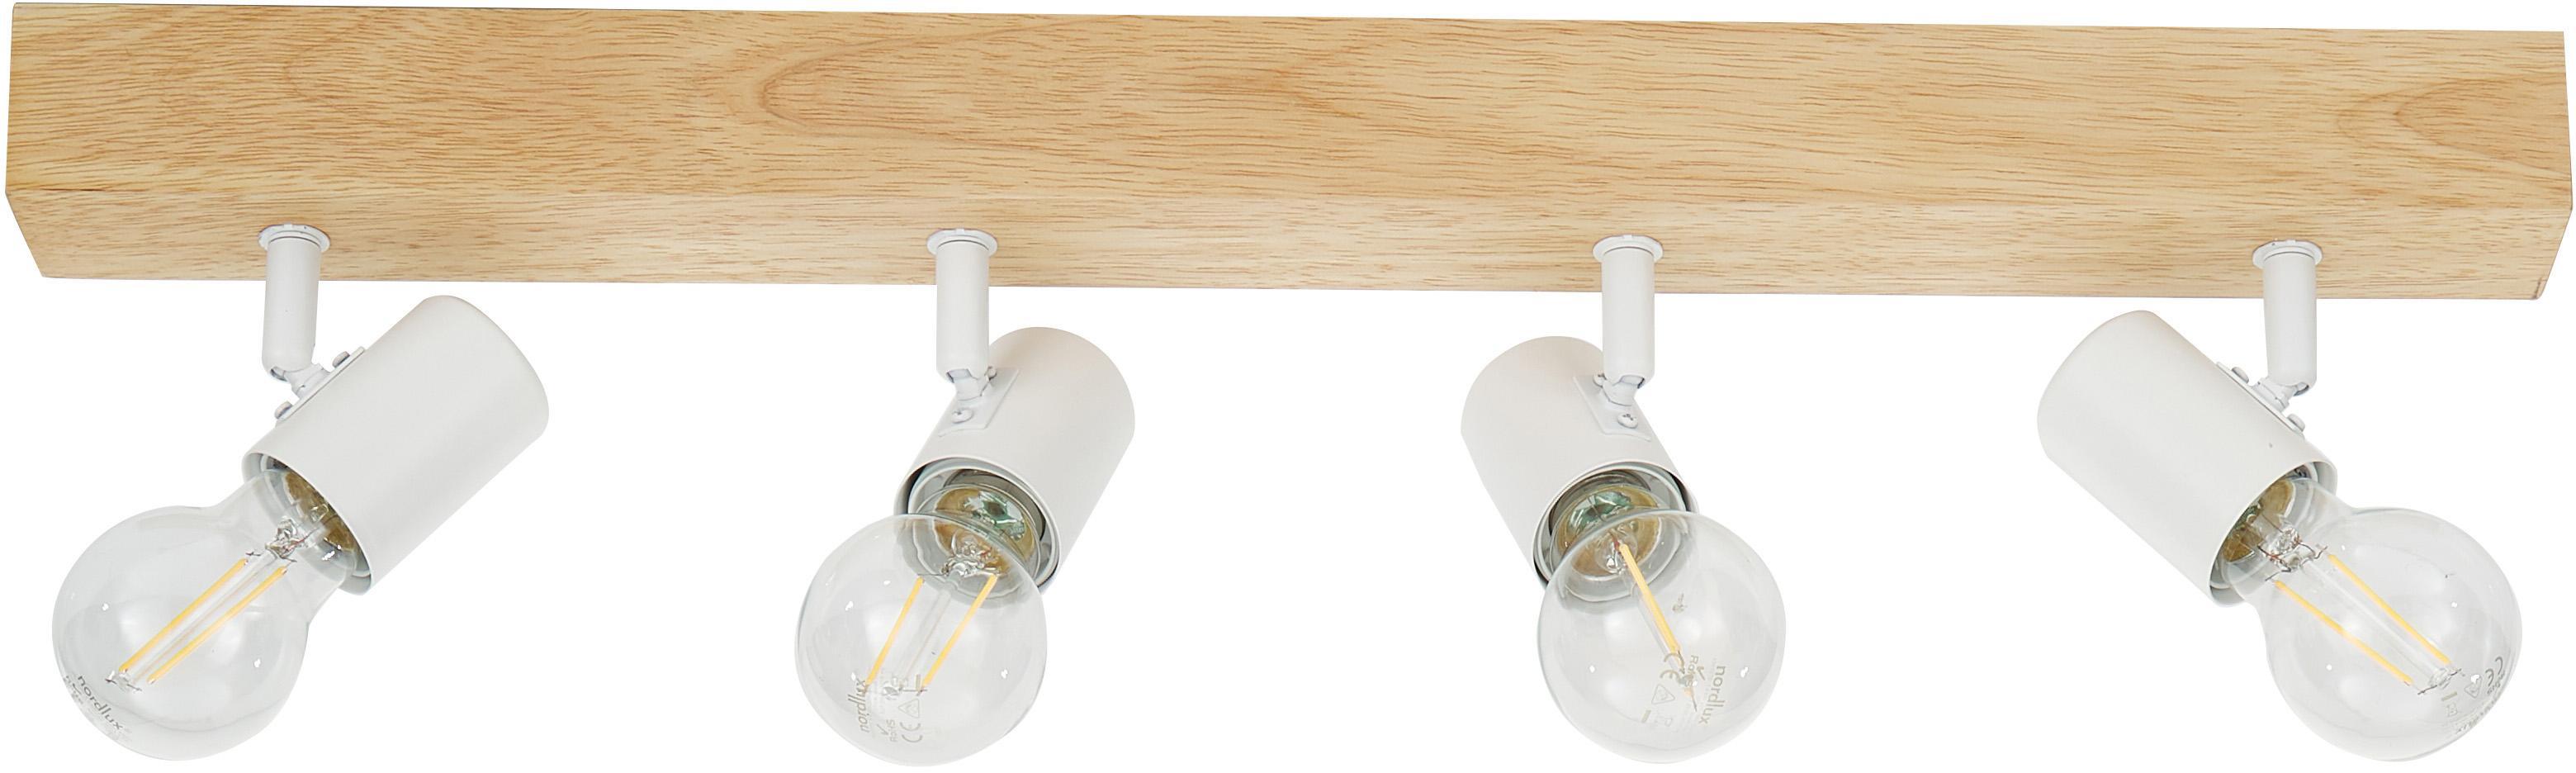 Riel Townshend, Barra: madera, Blanco, madera, An 63 x Al 13 cm